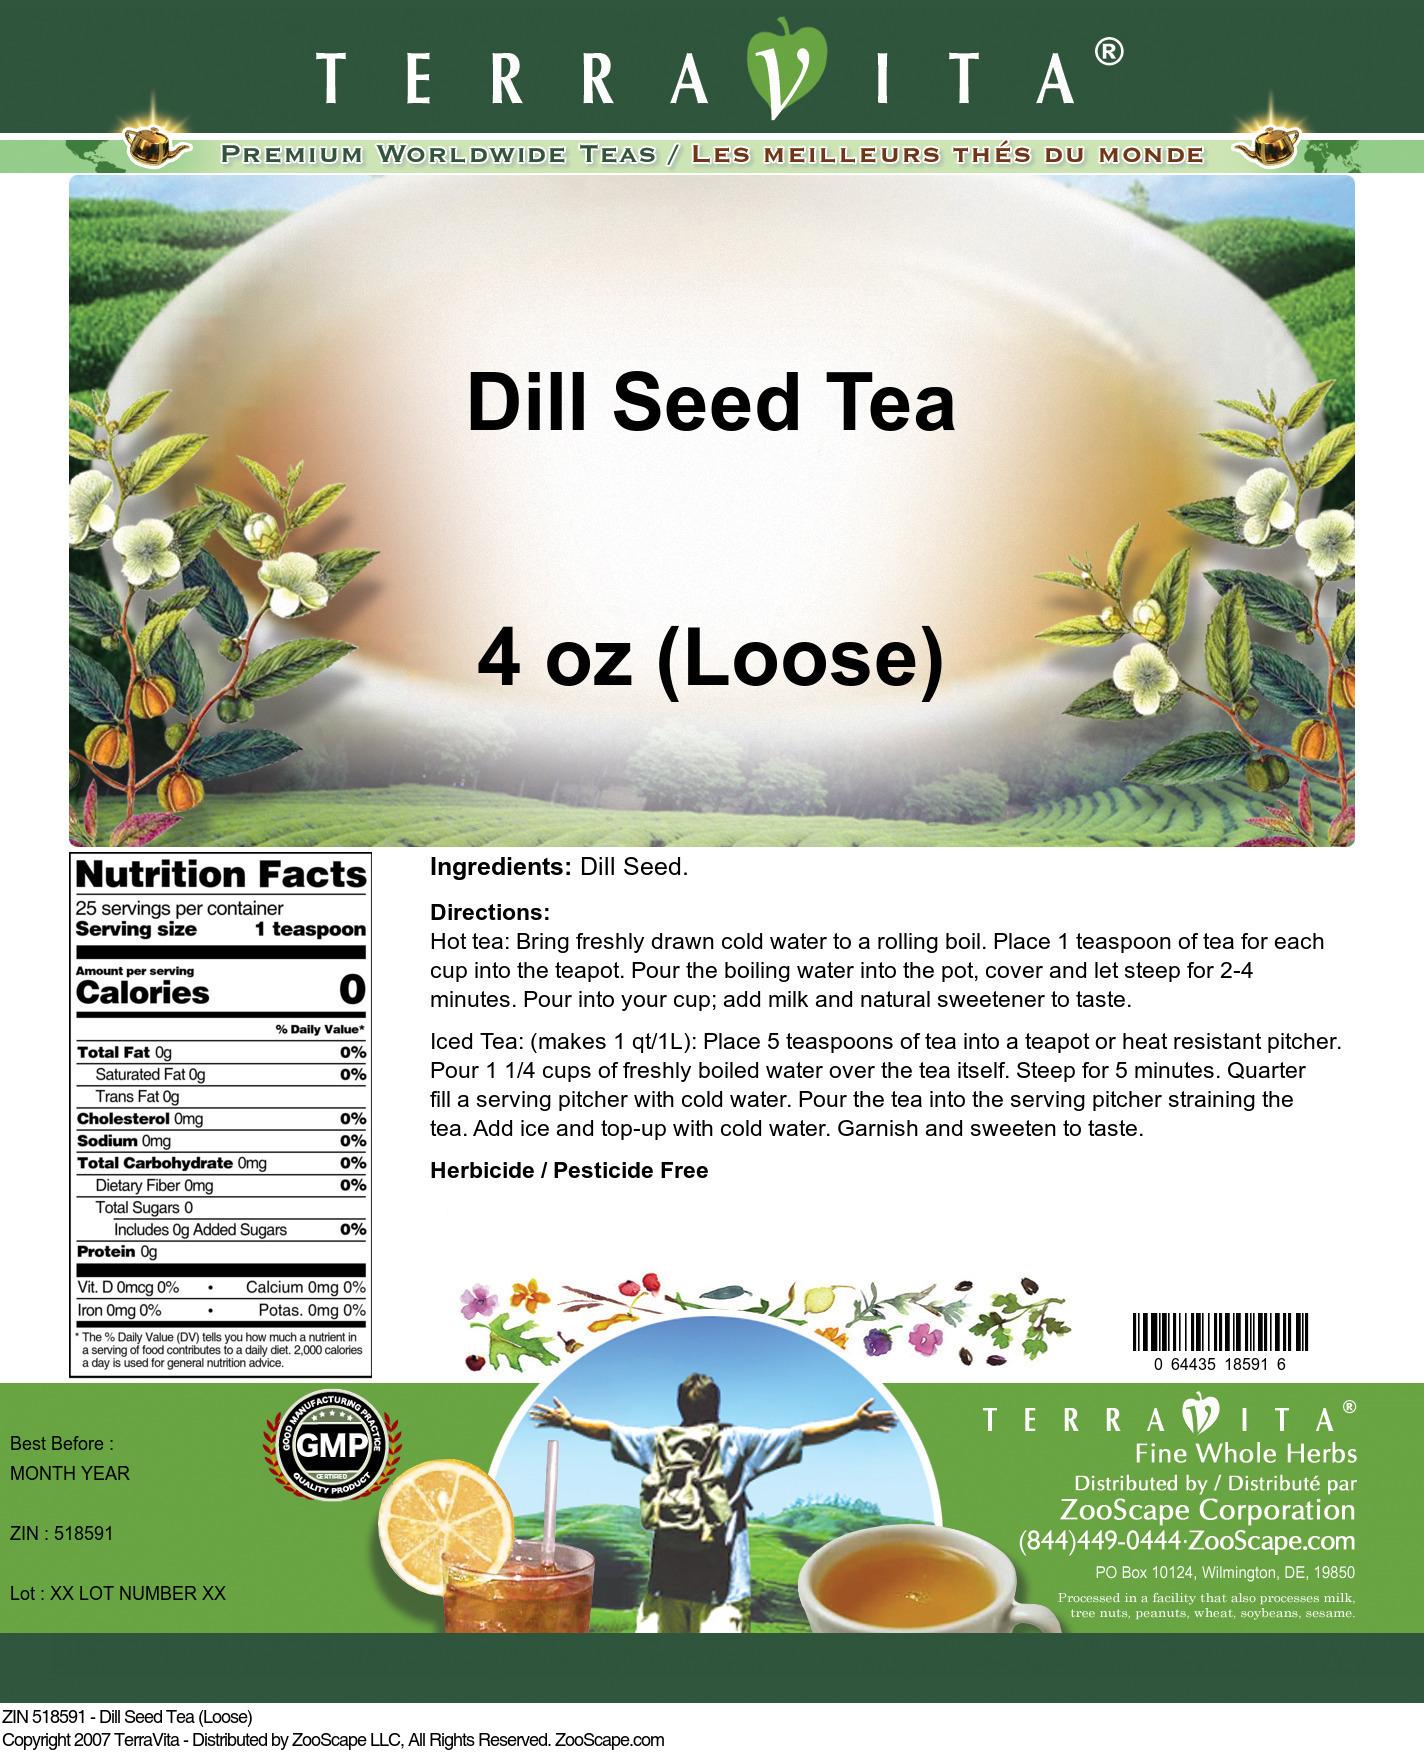 Dill Seed Tea (Loose)